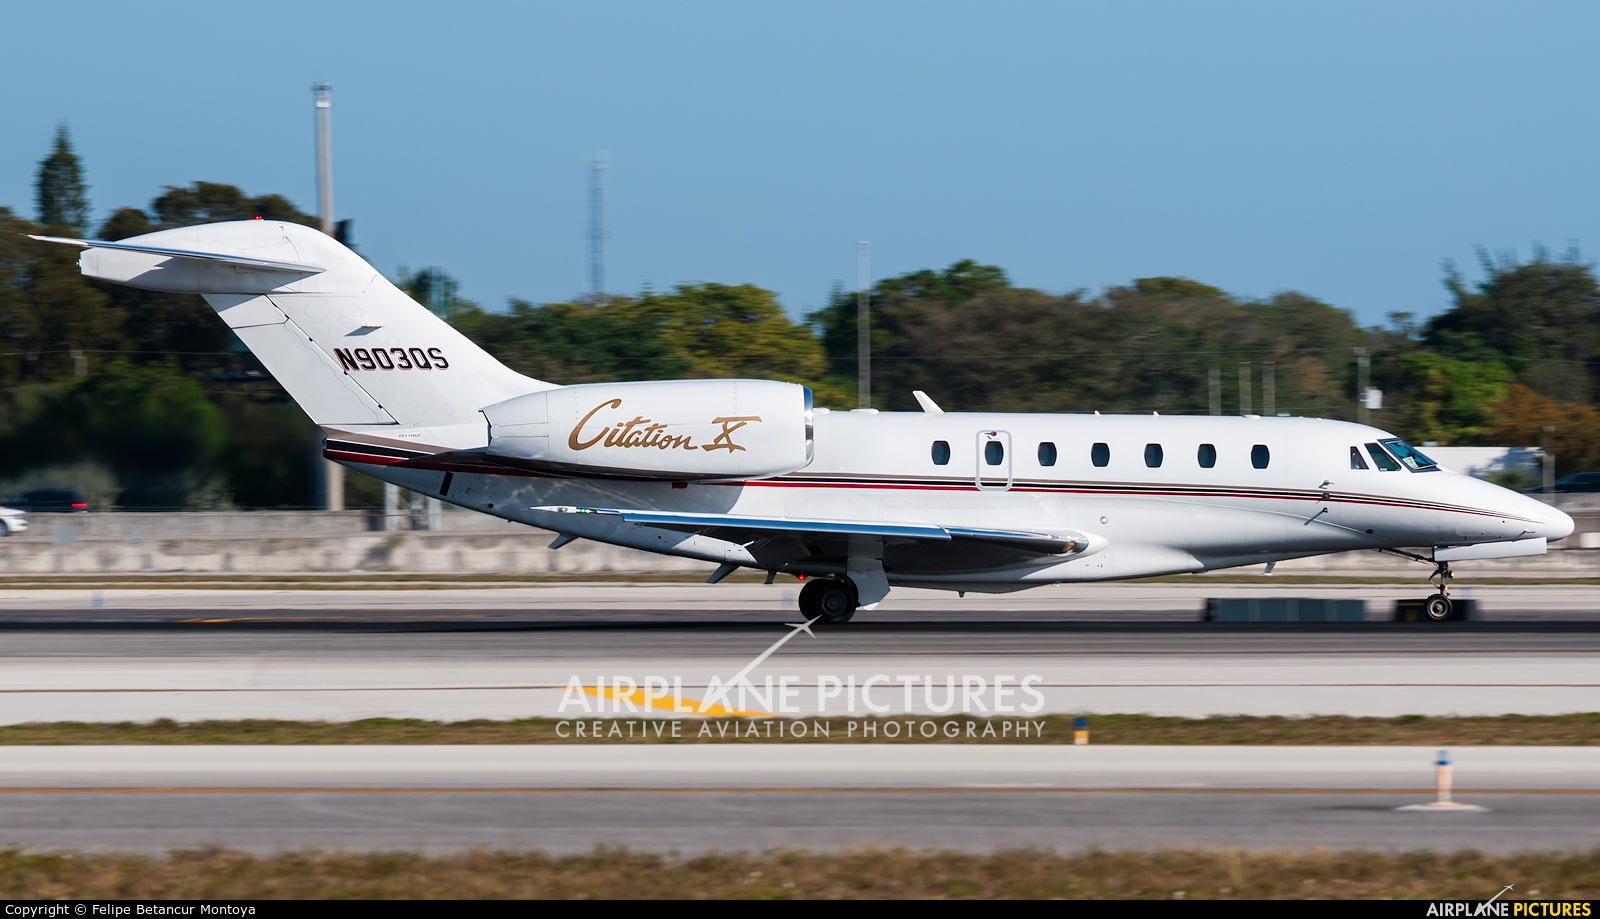 Netjets (USA) N903QS aircraft at Fort Lauderdale - Hollywood Intl